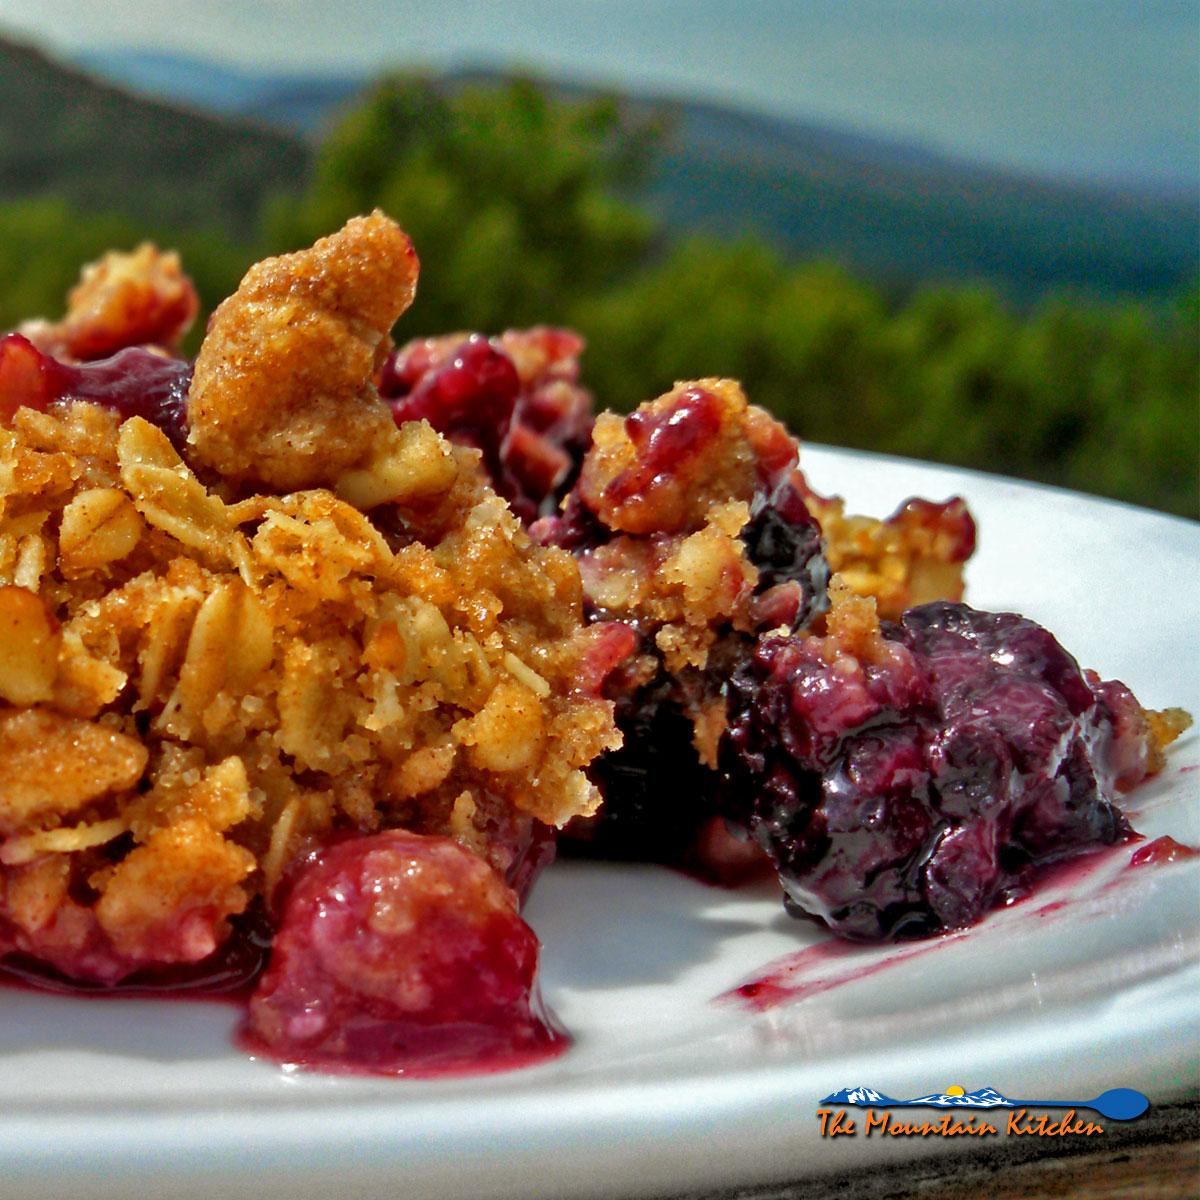 David's Blackberry Crisp With Farm Fresh Blackberries